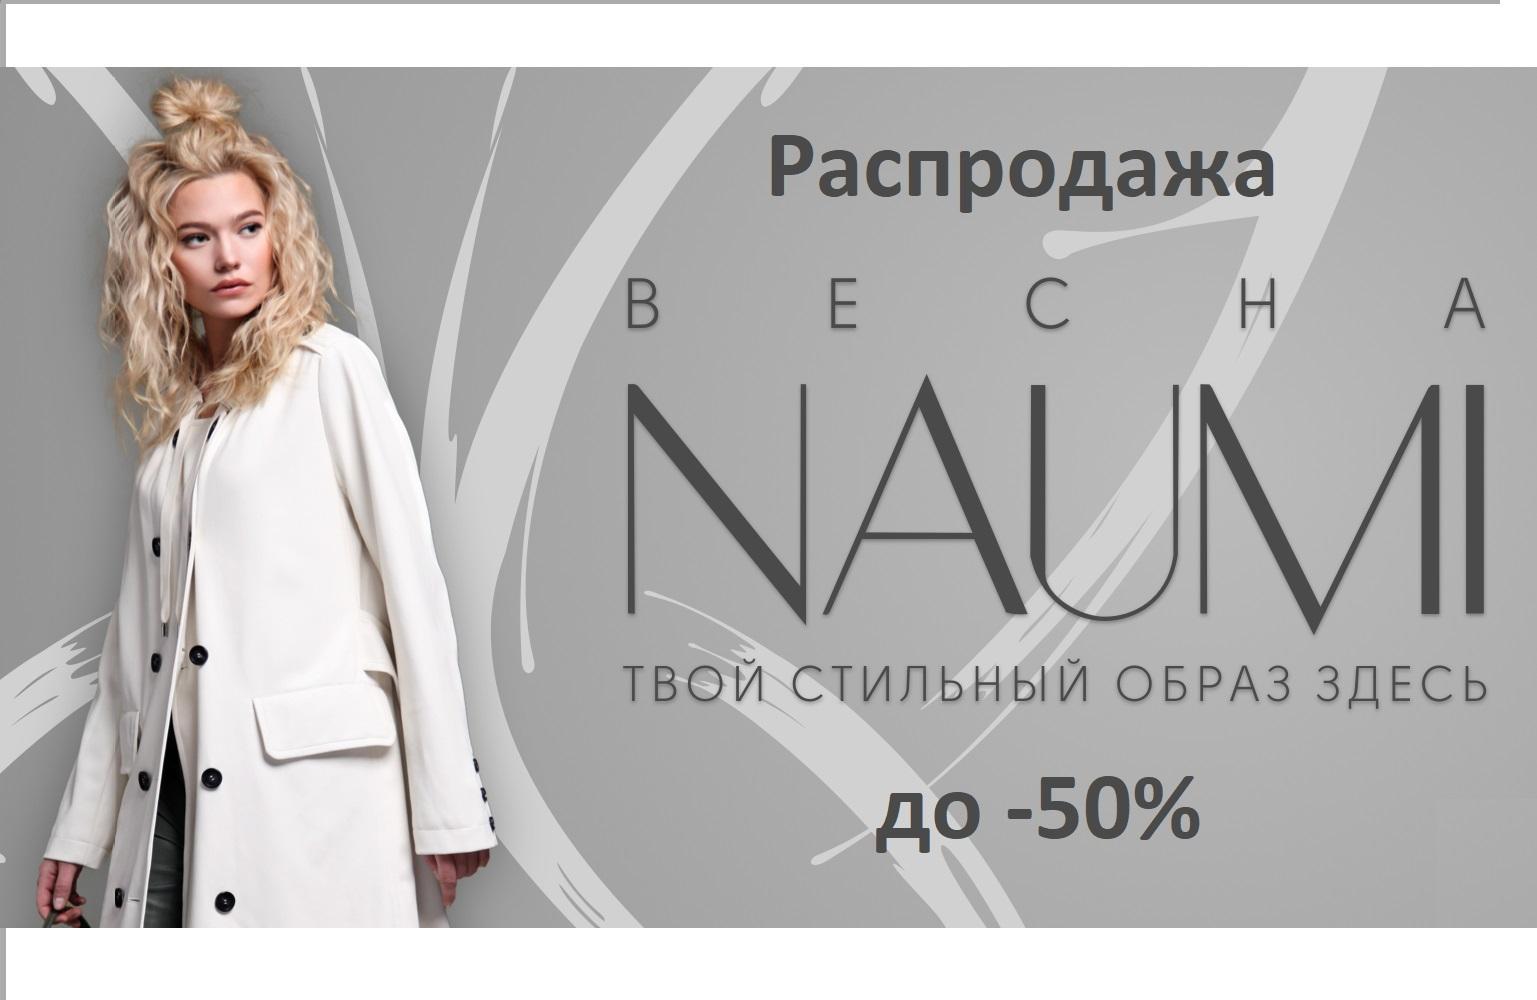 Распродажа весна Науми